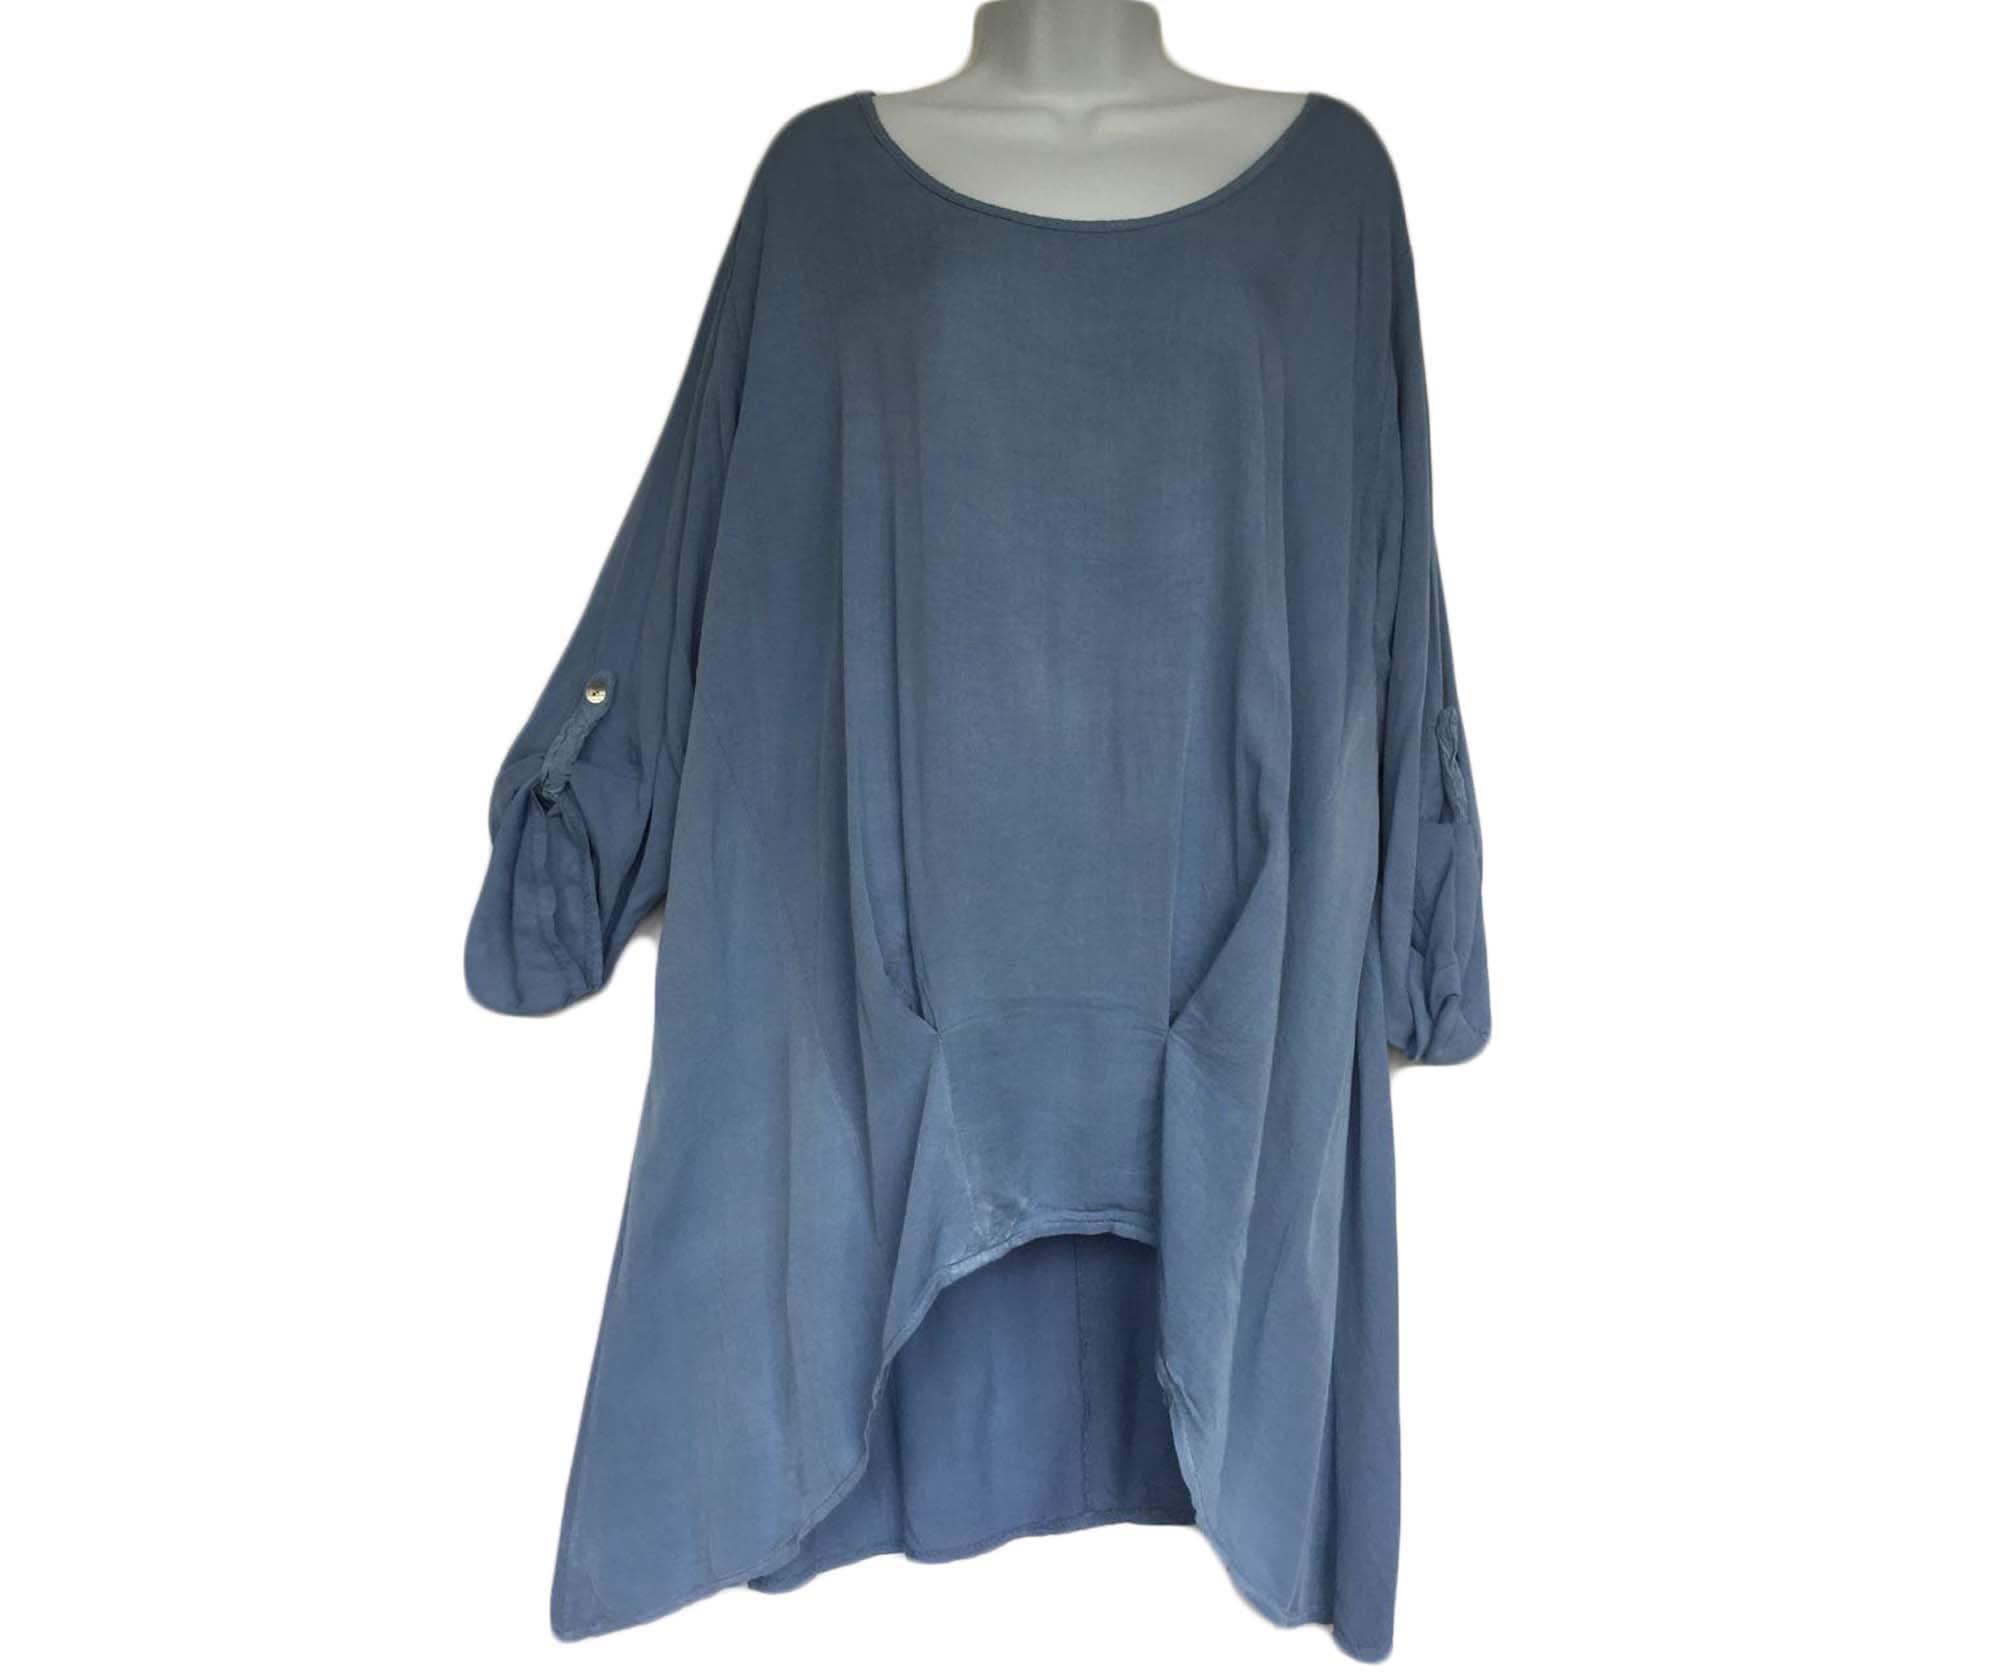 New Womens Italian Quirky Lagenlook Frill Hem Womens Tunic Top Blouse Plus Sizes